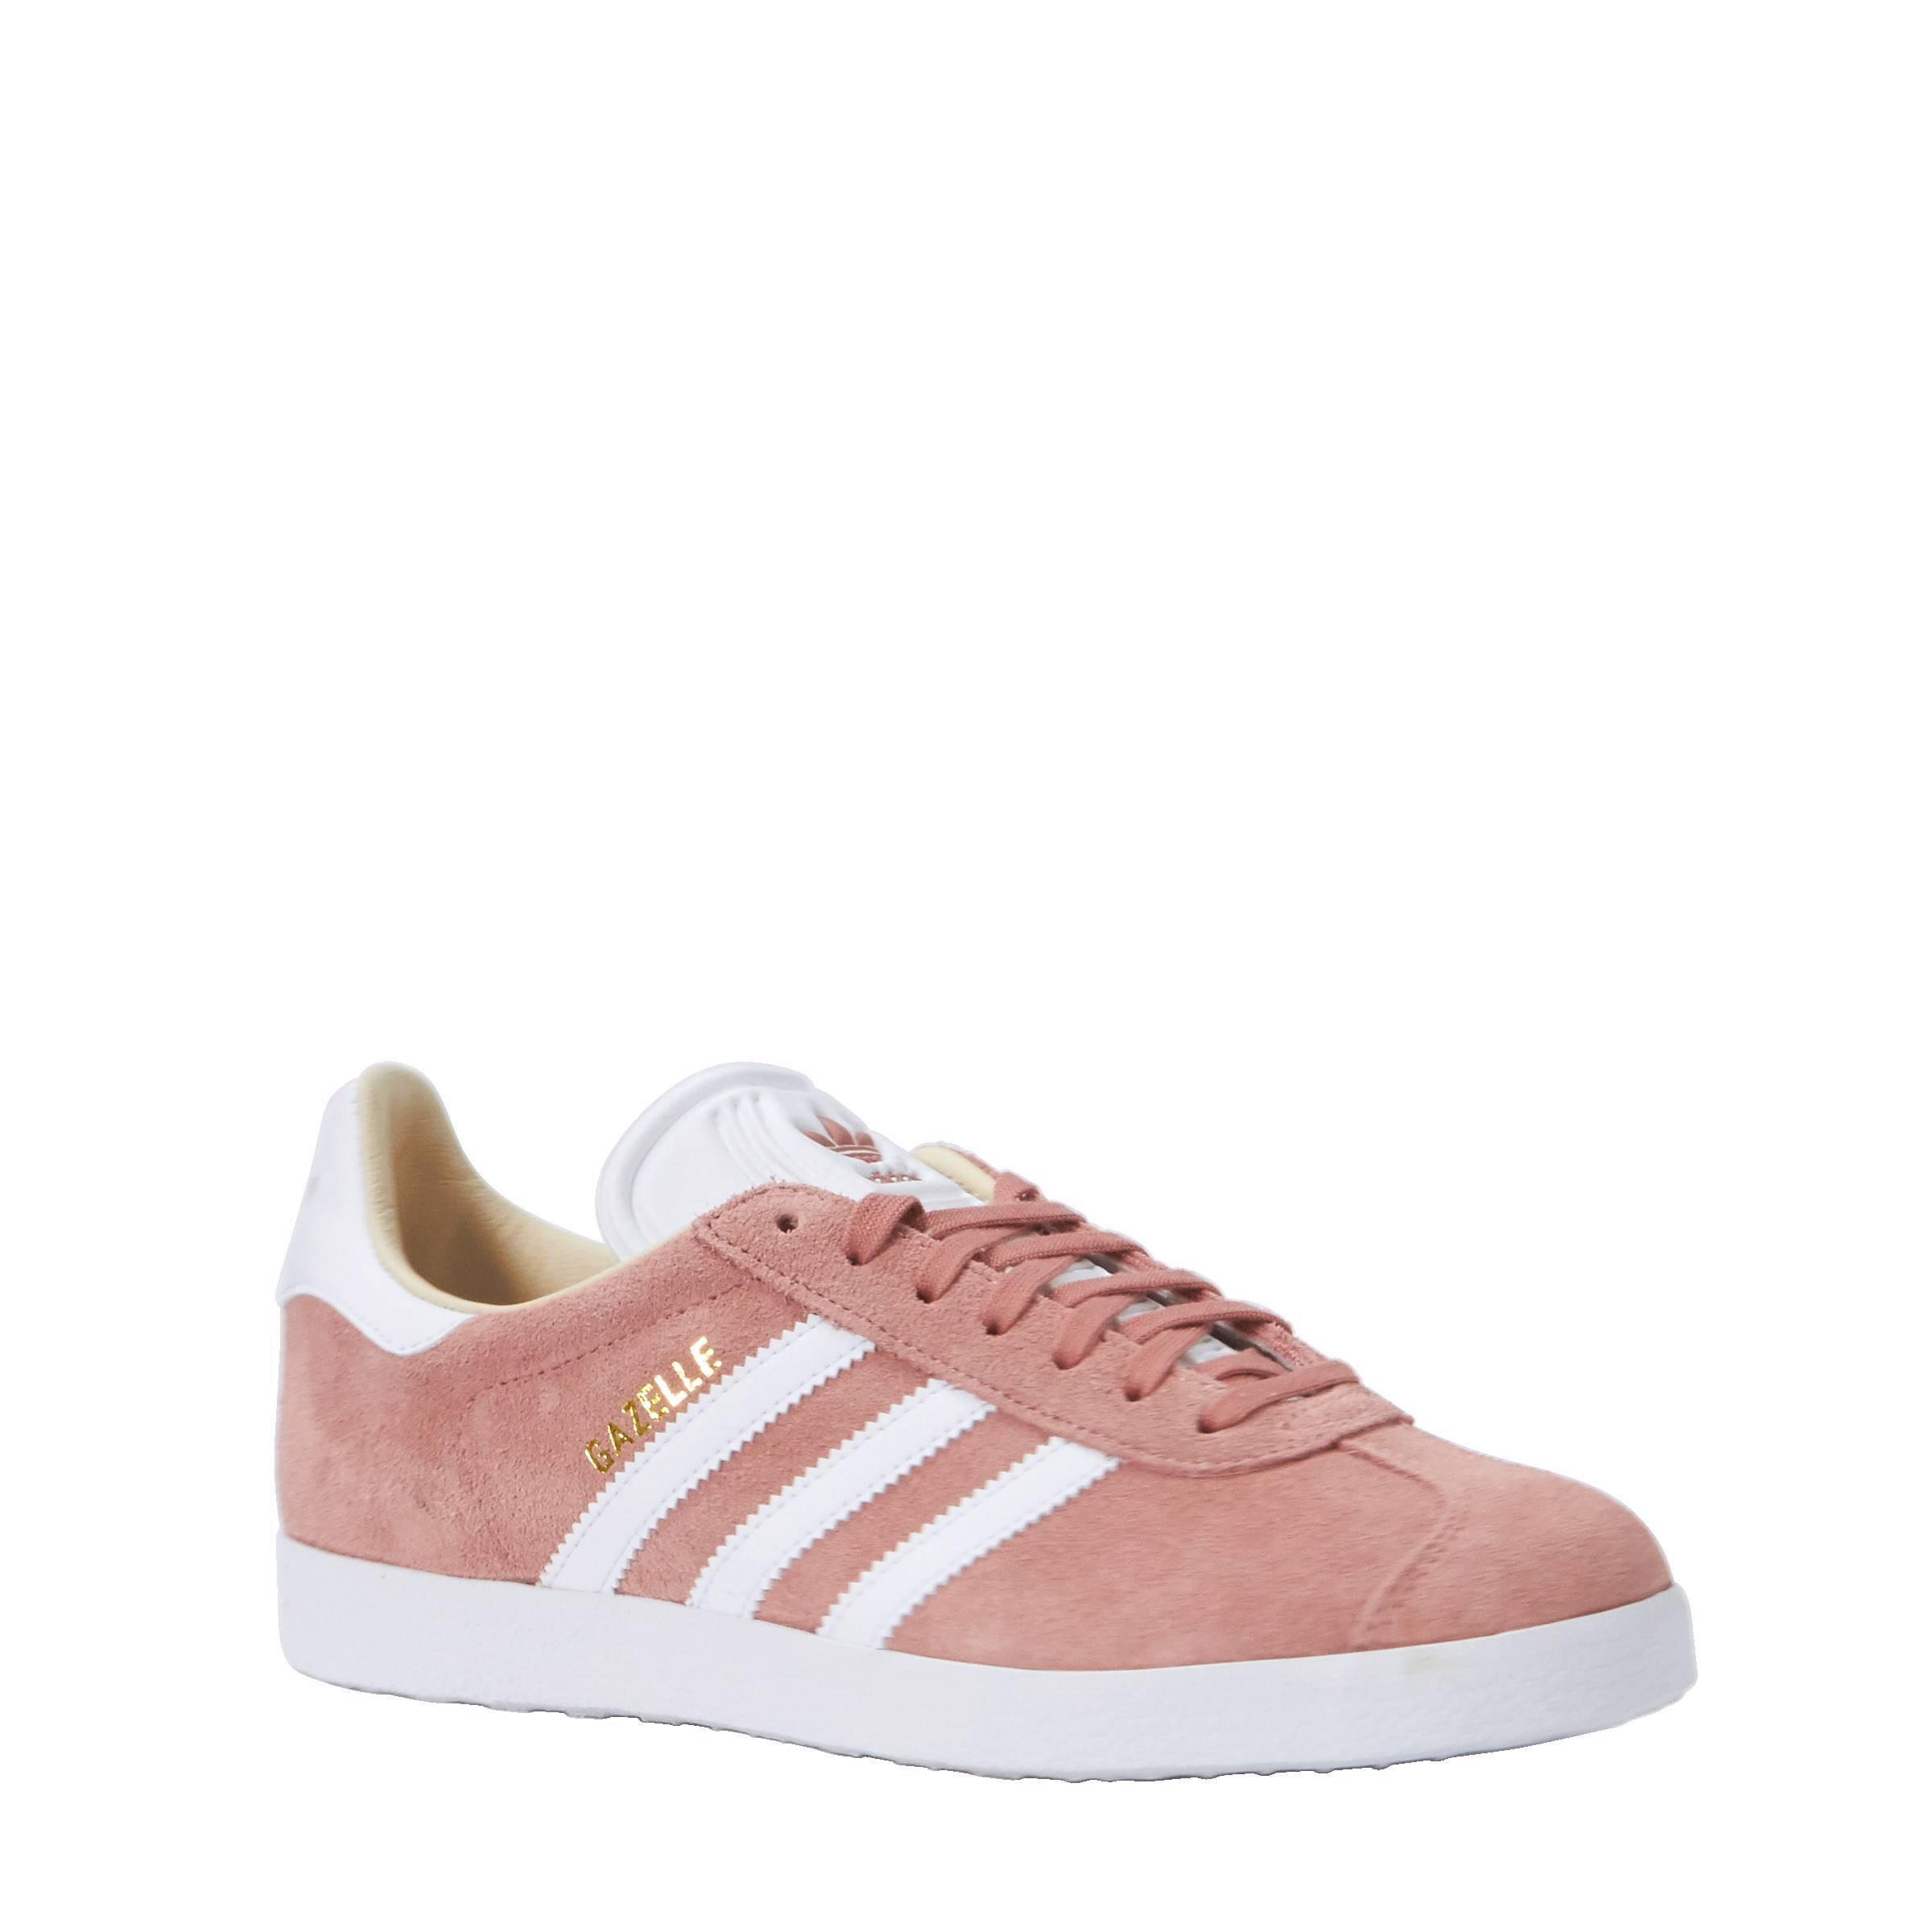 Gazelle Pink Adidas Adidas Pink Ladies Gazelle Ladies Gazelle Adidas qxBqPwX01t